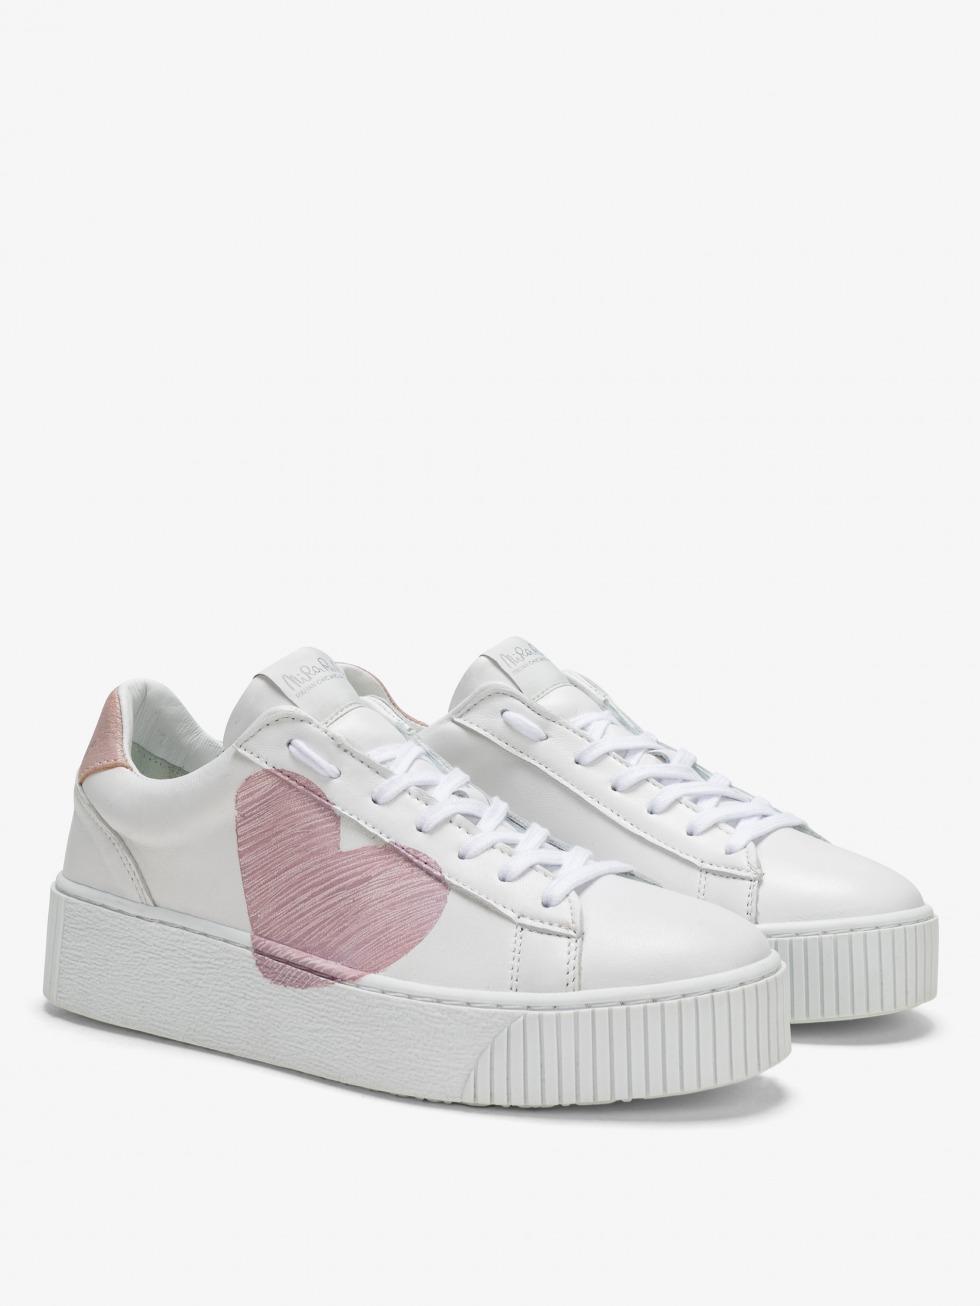 Cosmopolitan Sneakers - Dundee Heart